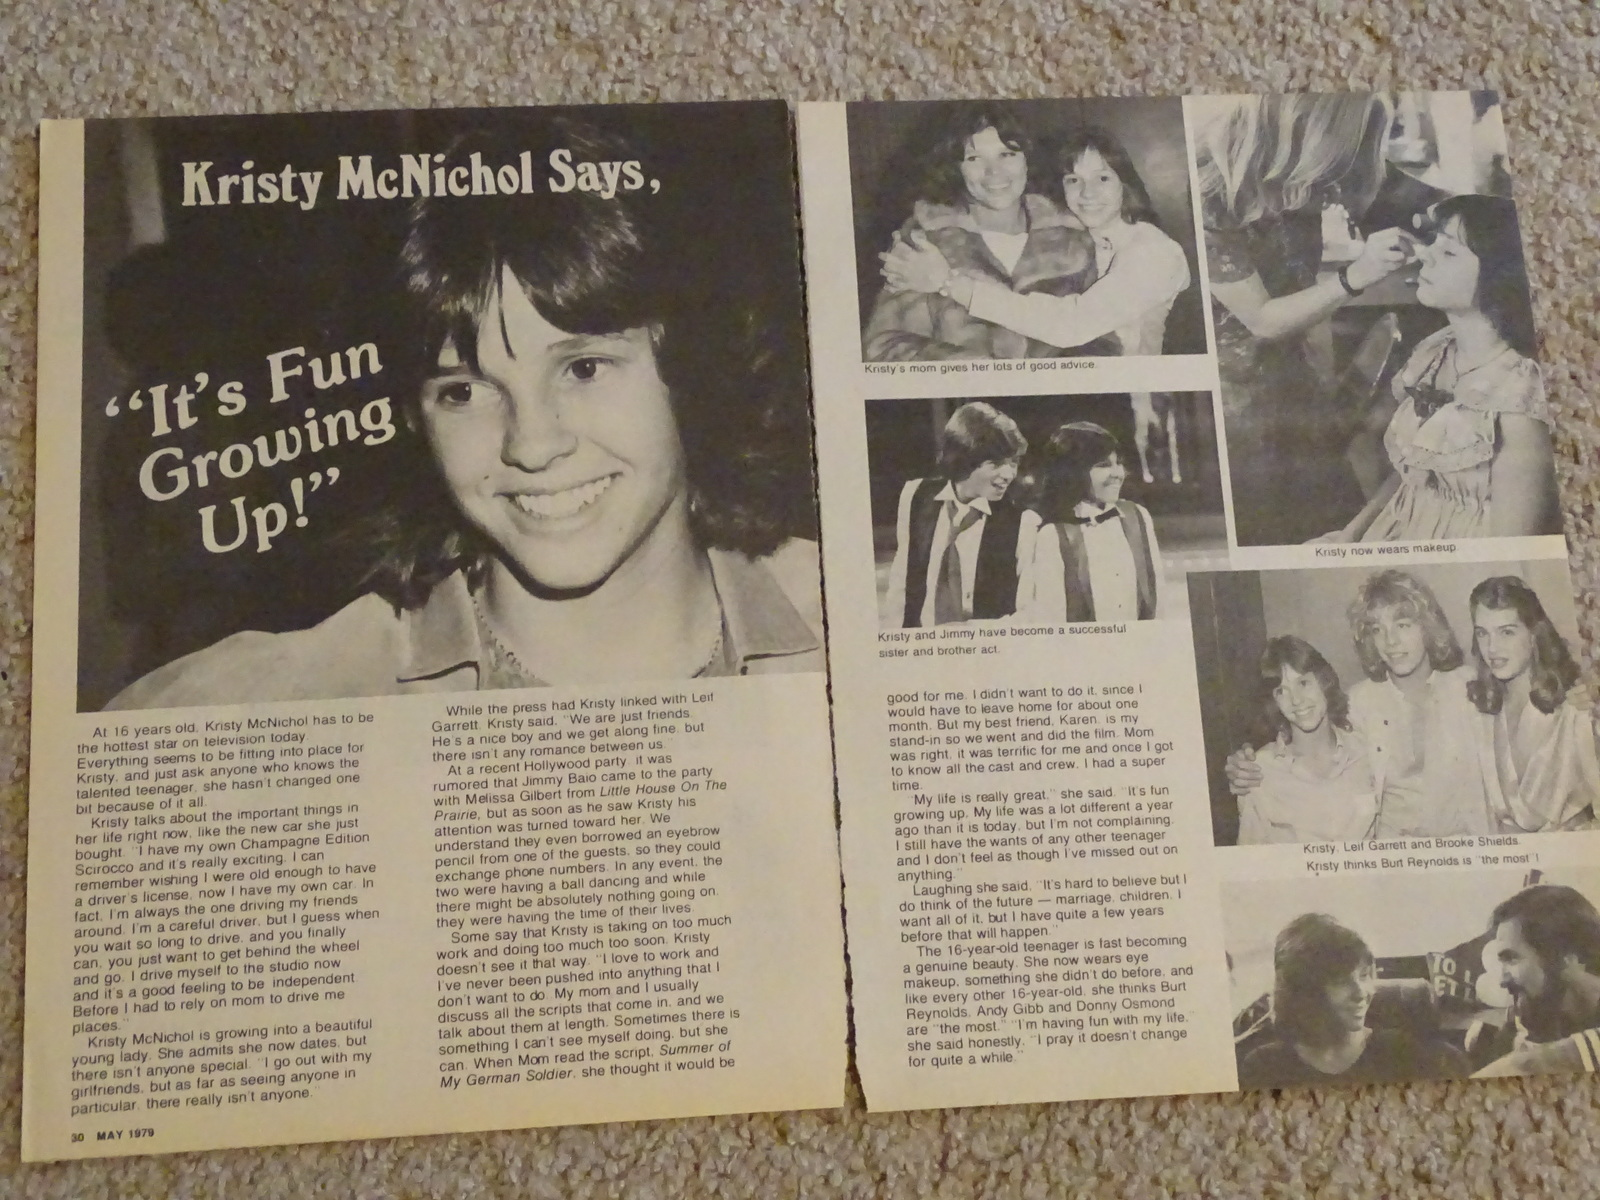 9e496d4b658 Kristy Mcnichol teen magazine pinup clipping it s fun growing up Tiger Beat  Bop